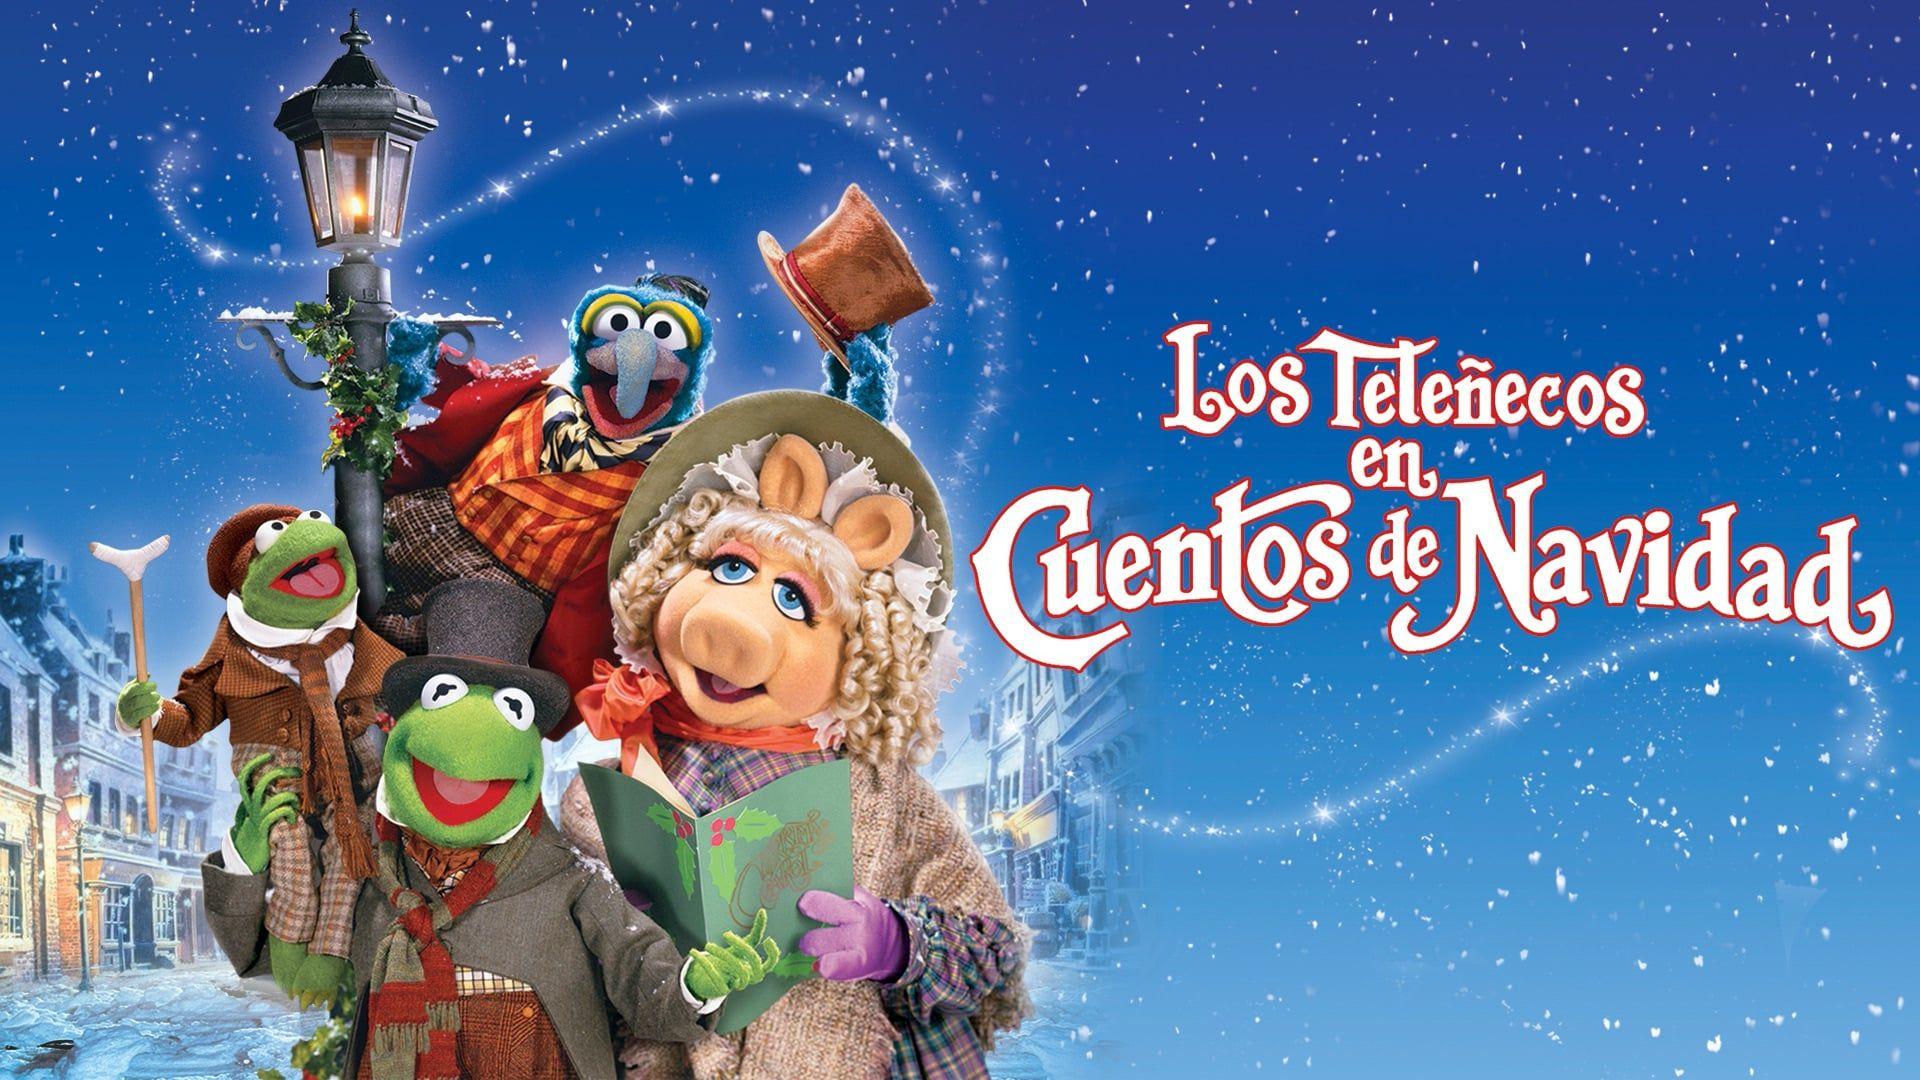 Dickens Karacsonyi Enekenek Szokatlan Am Megkapo Feldolgozasat Lathatjak A Nezok A Muppet Show Teljes Gardaja In 2020 Muppet Christmas Carol Muppets Christmas Carol